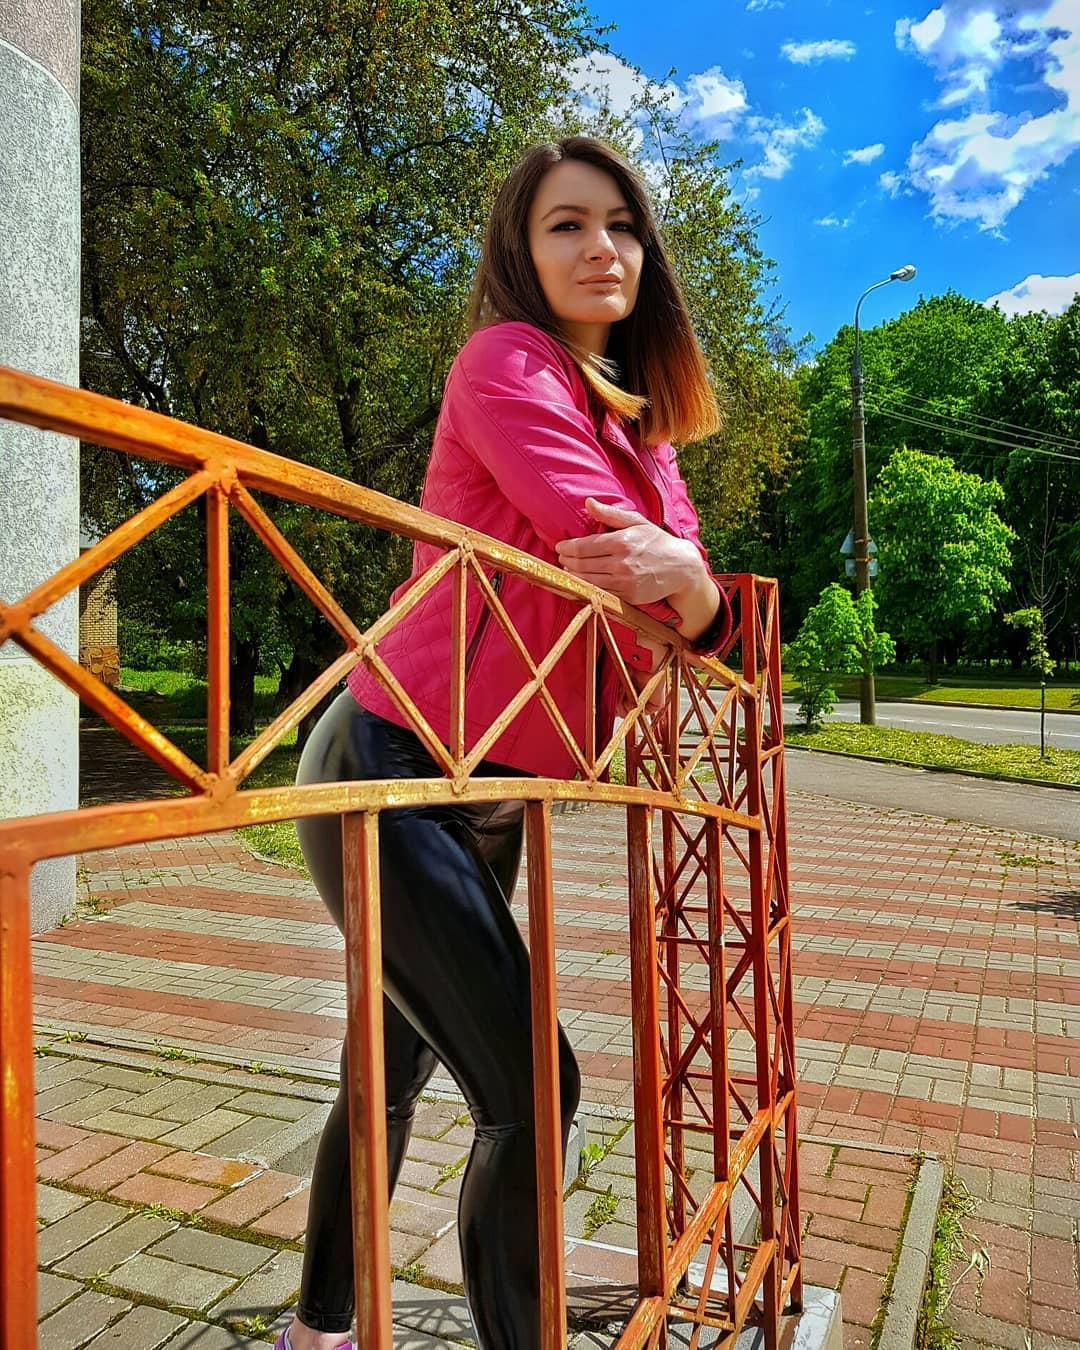 Olga-Madych-Wallpapers-Insta-Fit-Bio-16